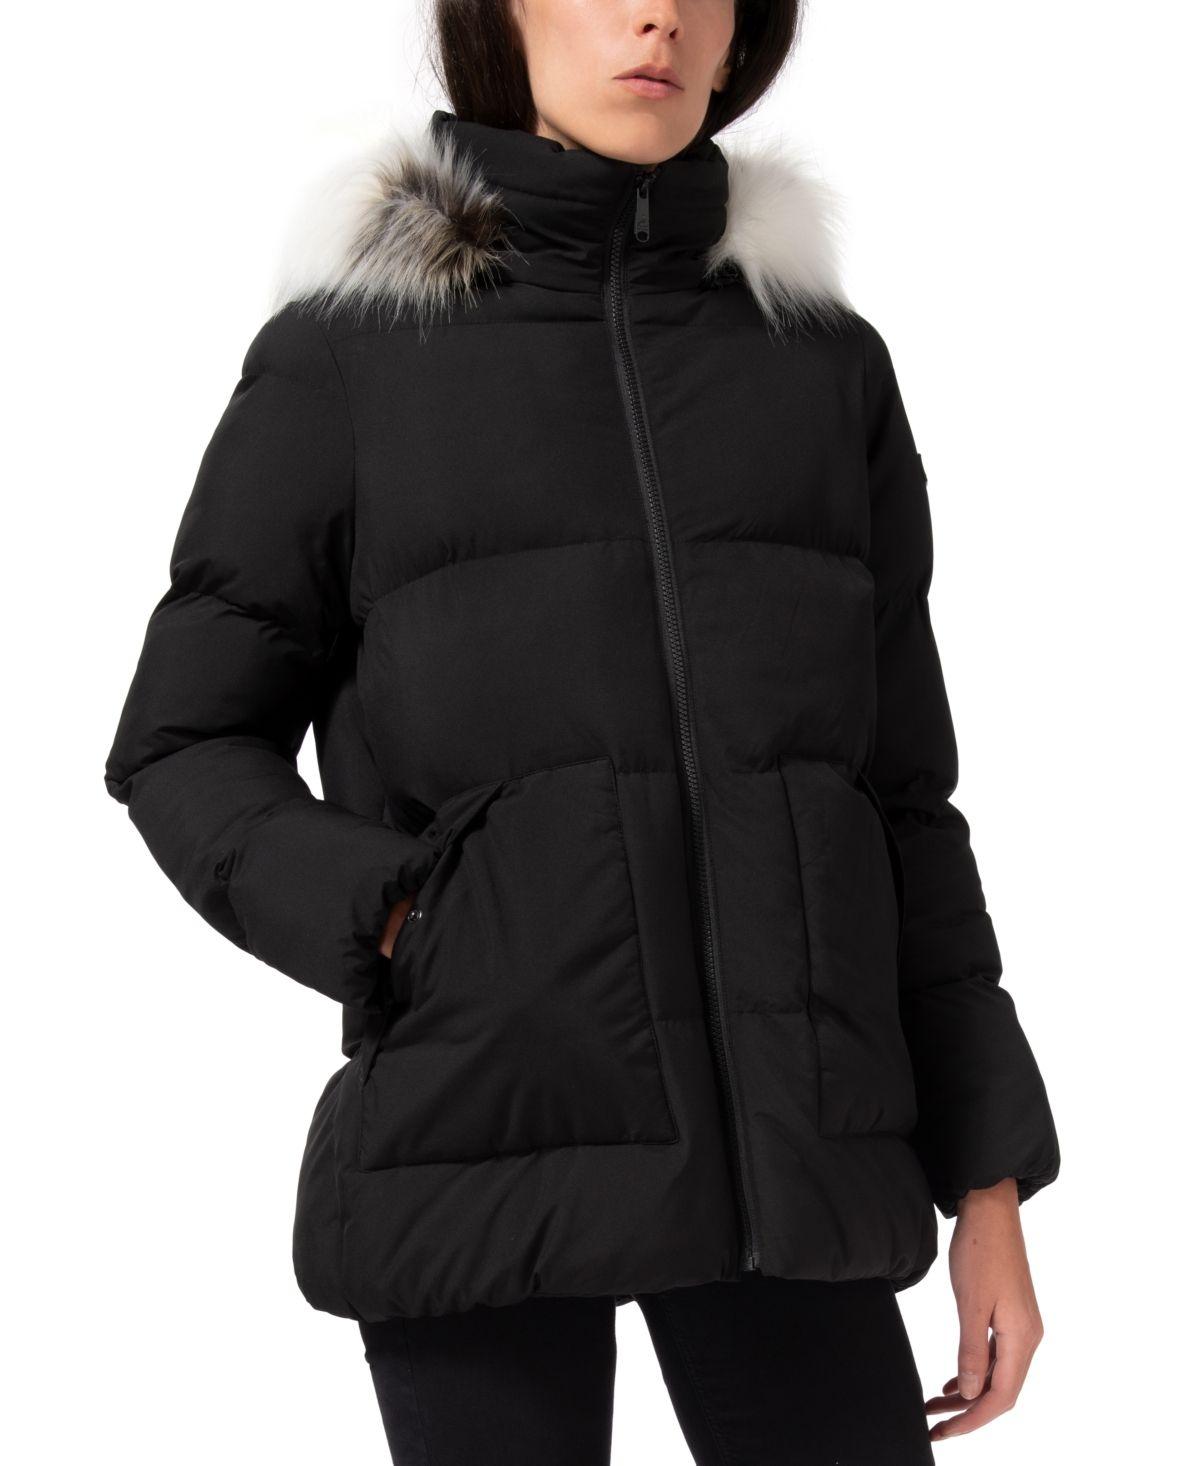 Sam Edelman Faux Fur Trim Hooded Puffer Coat Reviews Coats Women Macy S In 2021 Puffer Coat Coats For Women Fur Hood Coat [ 1466 x 1200 Pixel ]